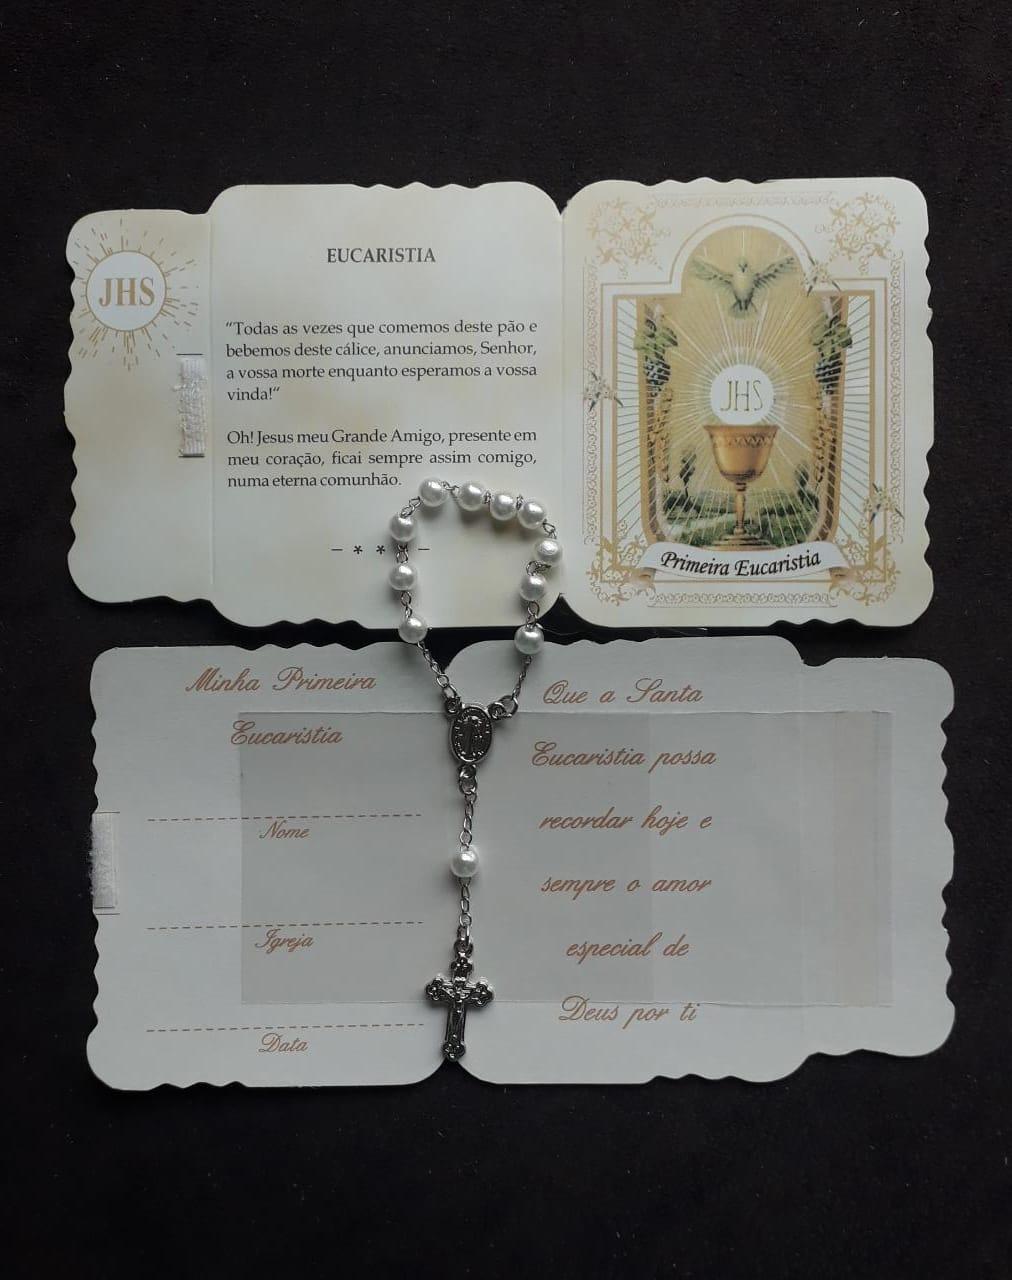 WE50 - Kit Lembrança Cartão 1ª Eucaristia c/ Dezena Perolada e Velcro  - VindVedShop - Distribuidora Catolica